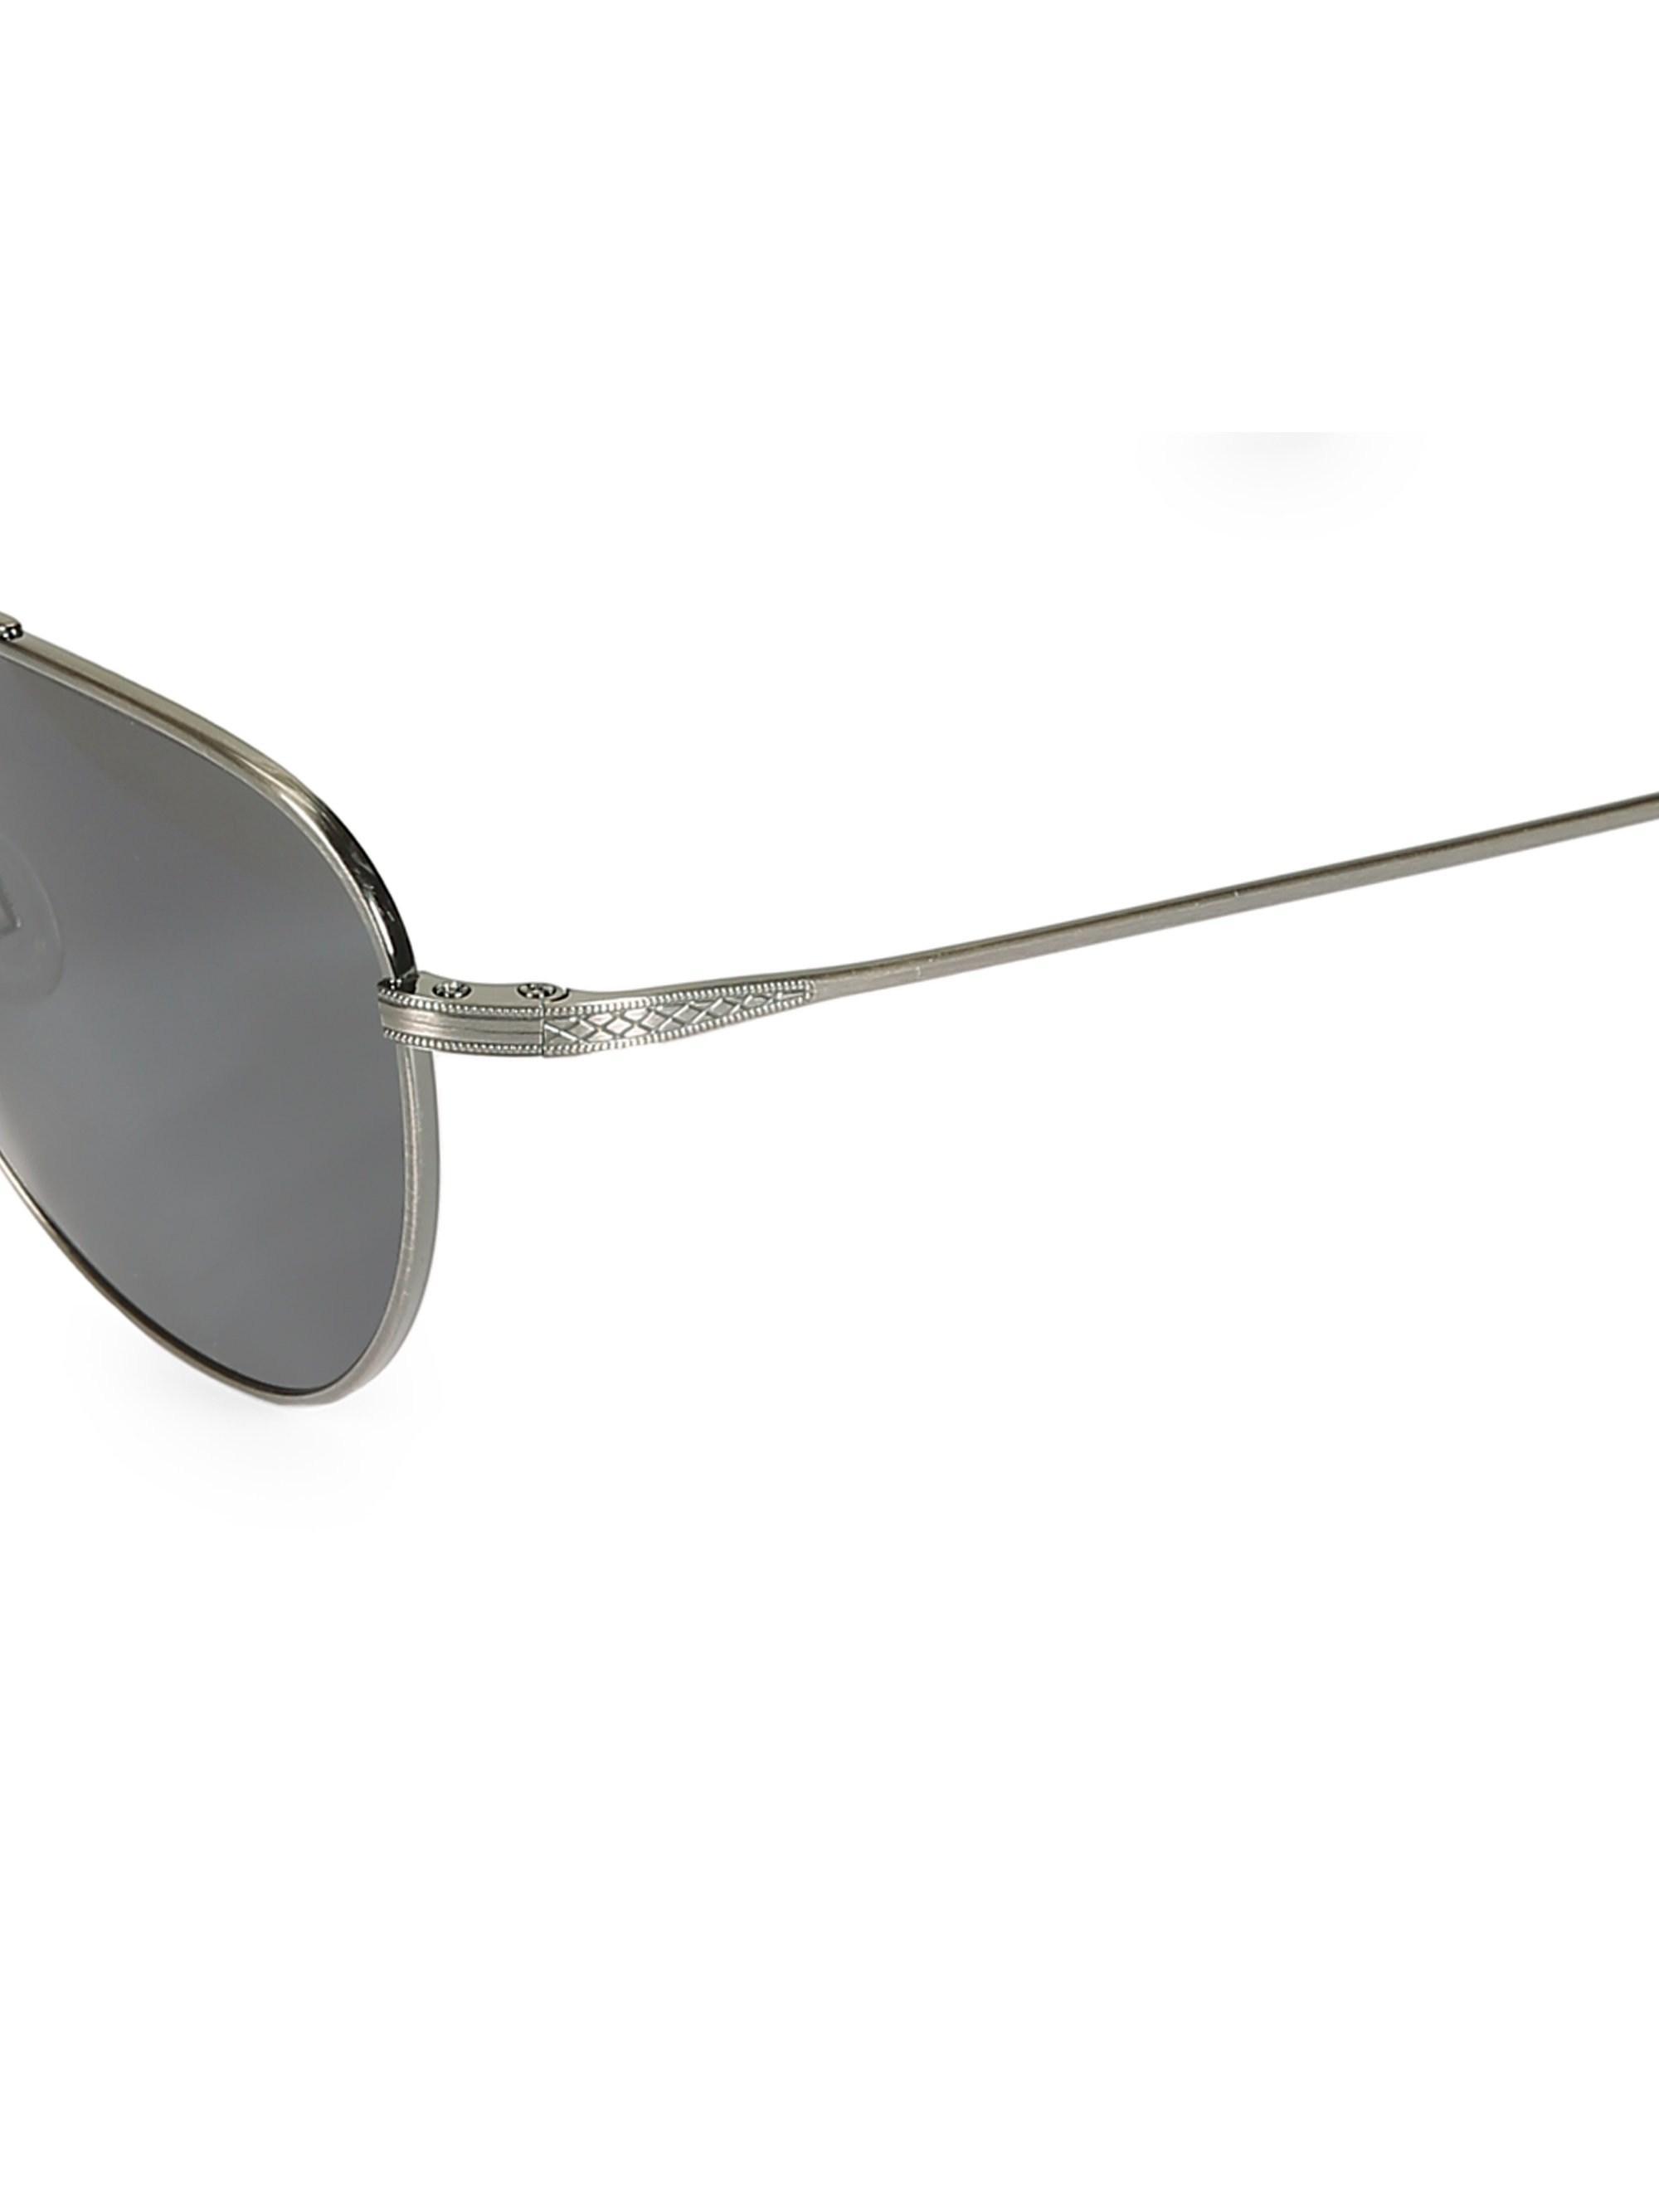 73fe7a01fe Lyst - Barton Perreira 55mm Aerial Pewter Aviator Sunglasses in ...